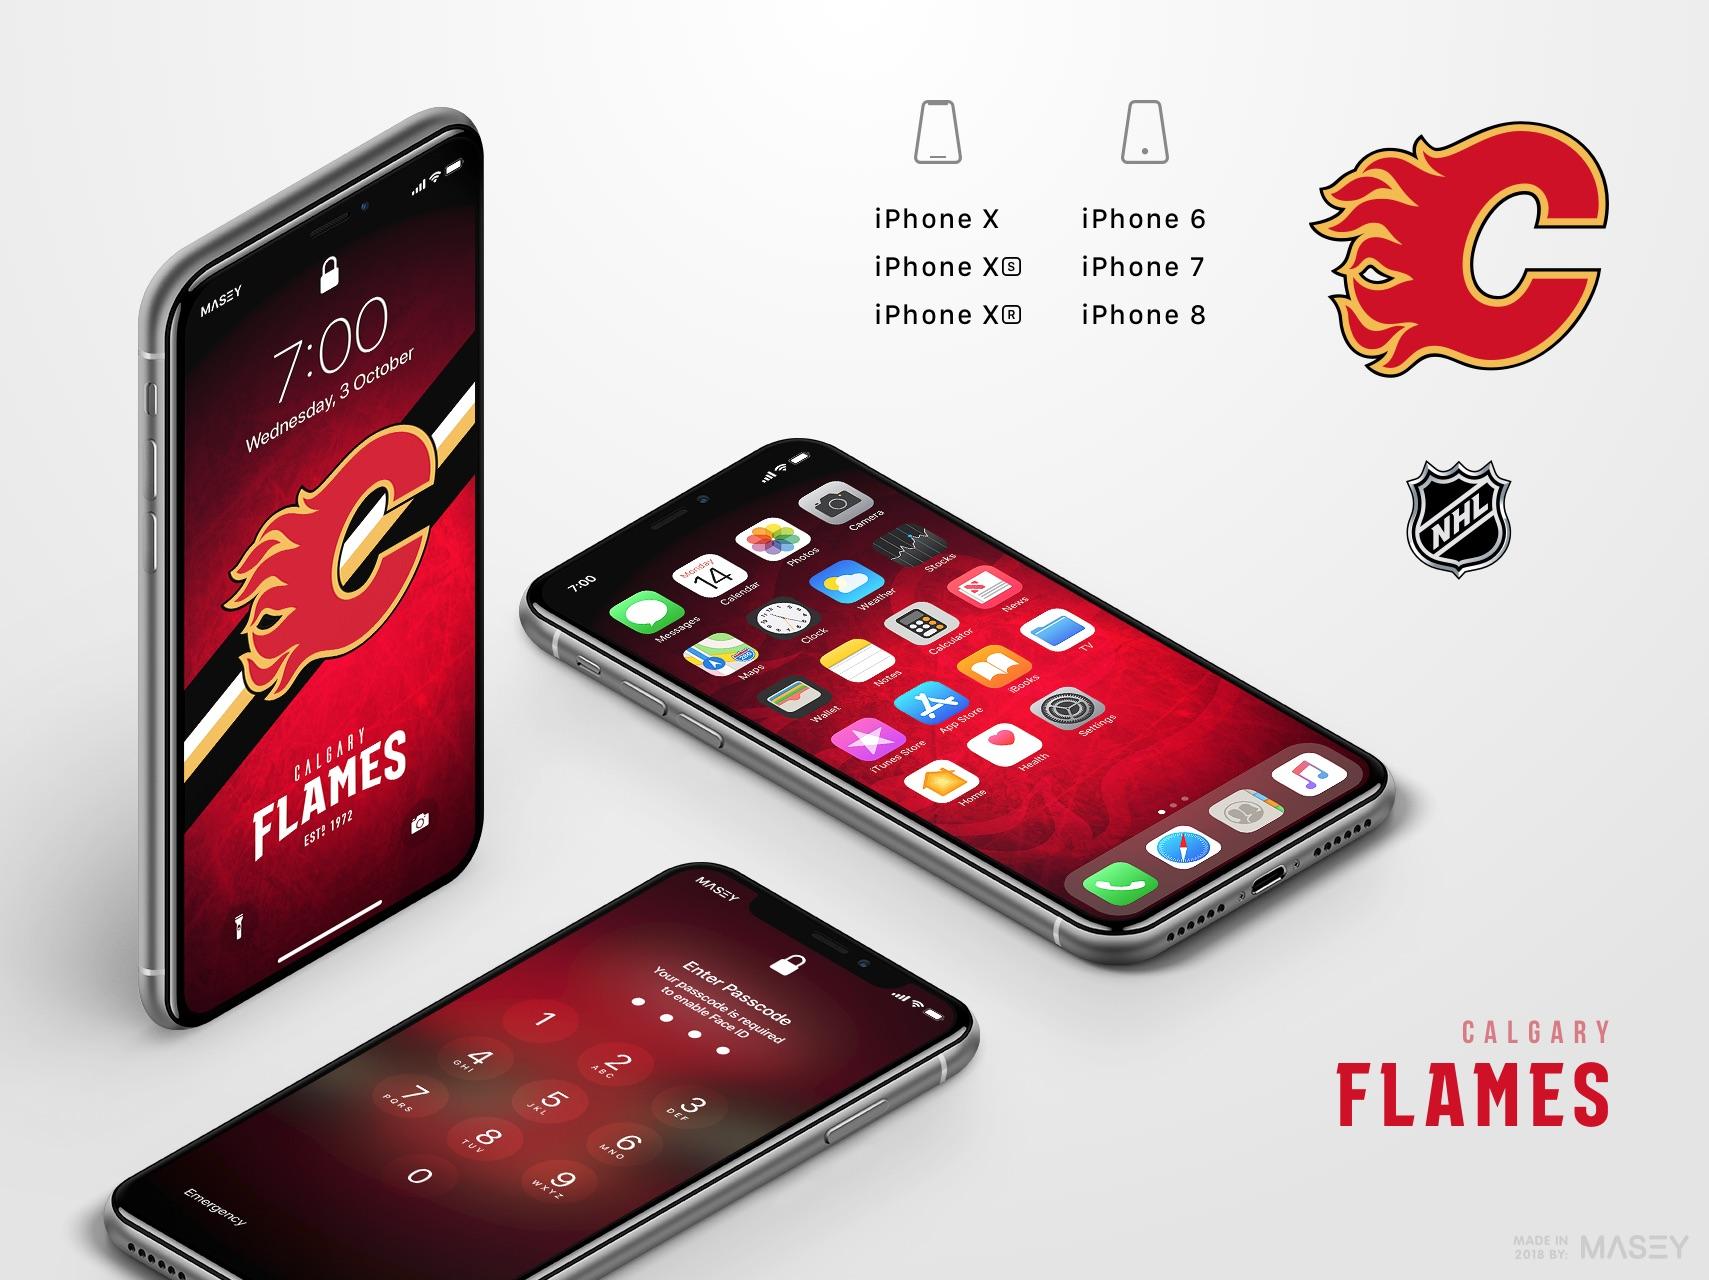 Calgary Flames iPhone Wallpaper